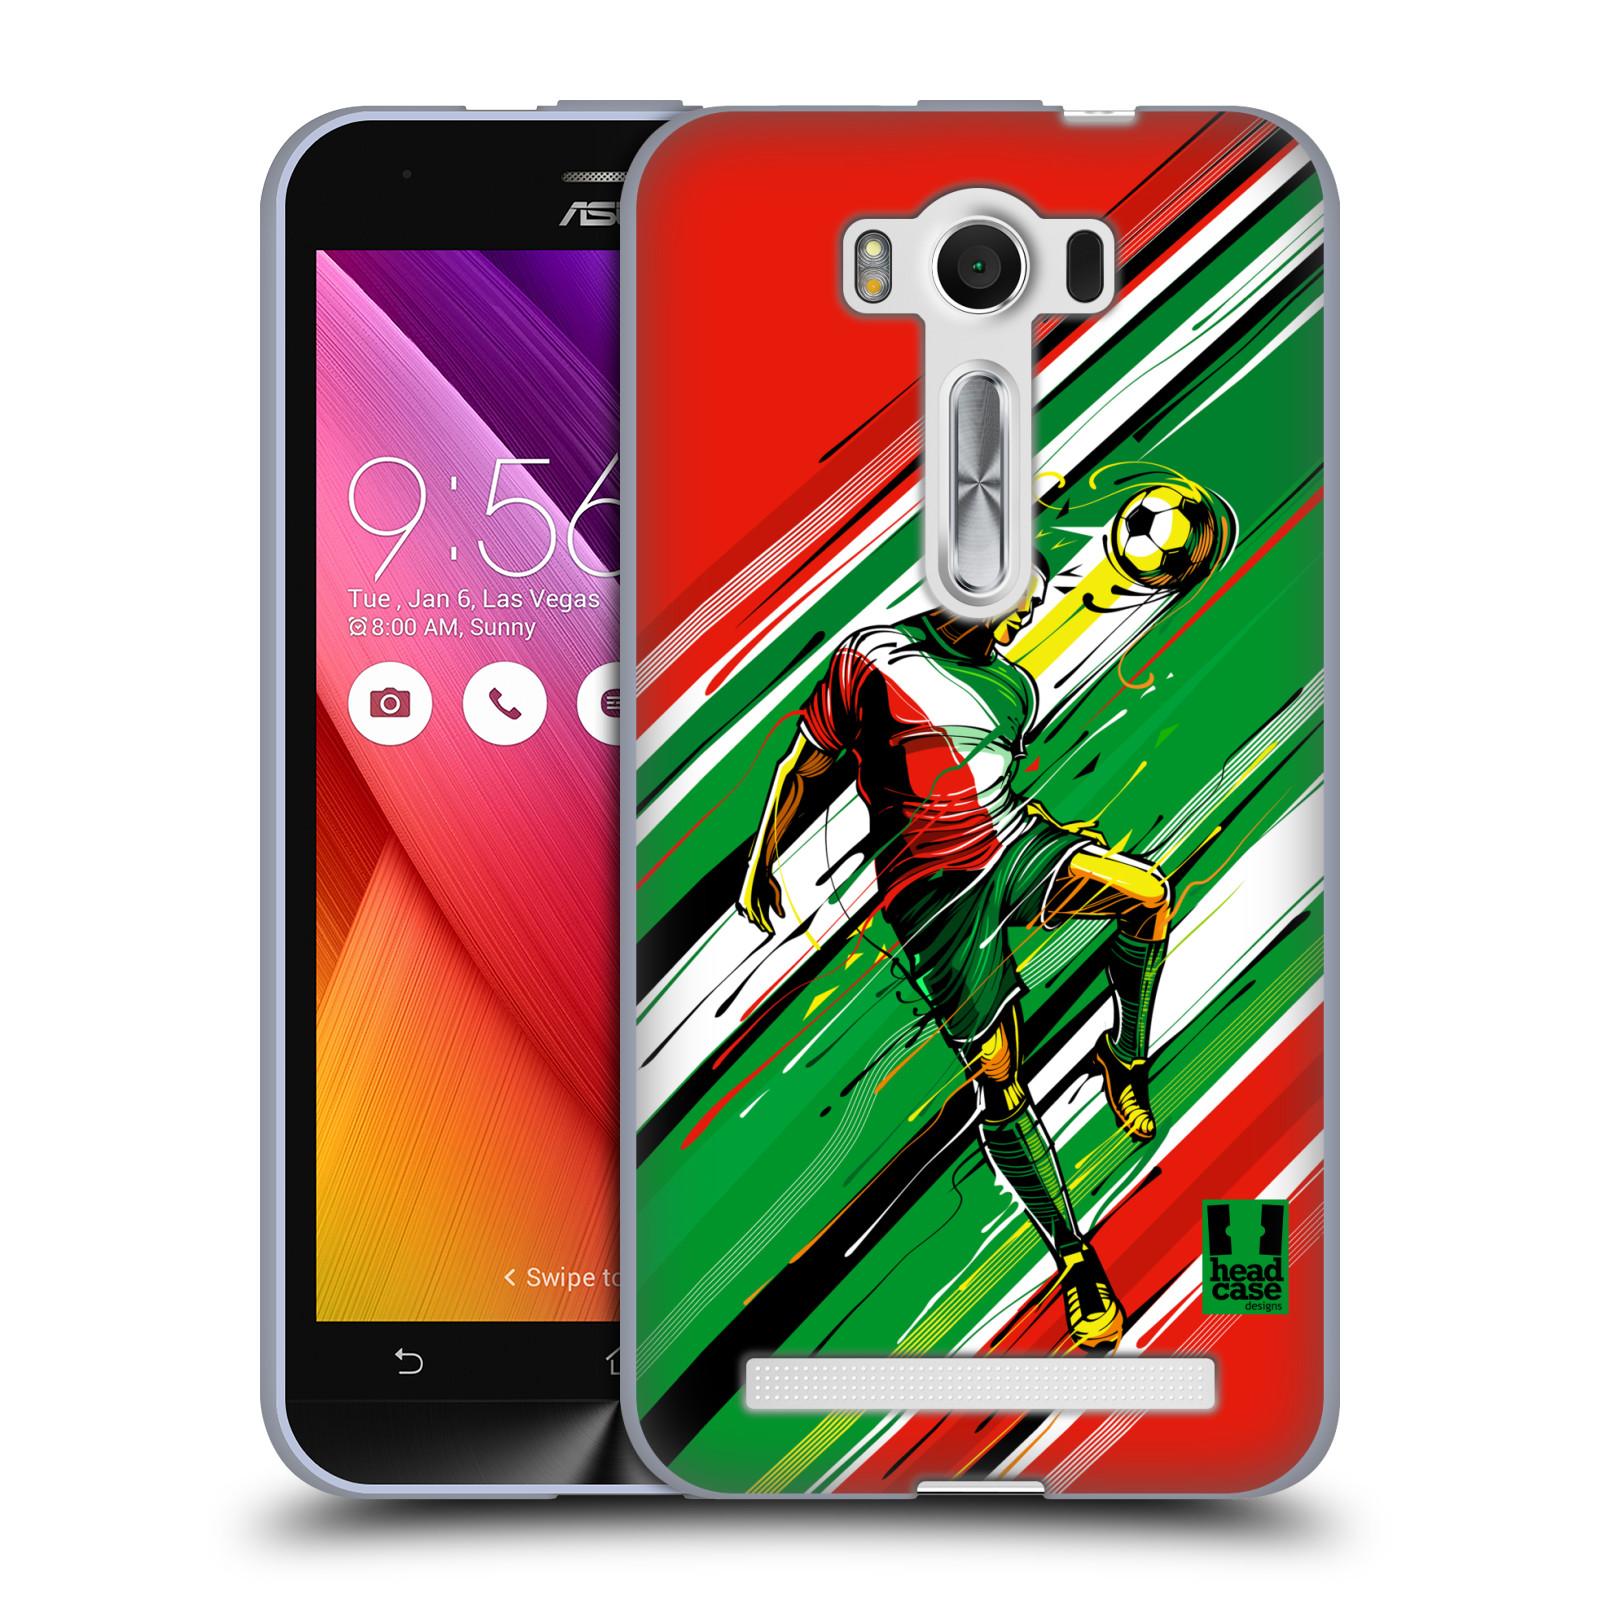 "Silikonové pouzdro na mobil Asus ZenFone 2 Laser ZE500KL HEAD CASE HLAVIČKA (Silikonový kryt či obal na mobilní telefon Asus ZenFone 2 Laser ZE500KL s 5"" displejem)"